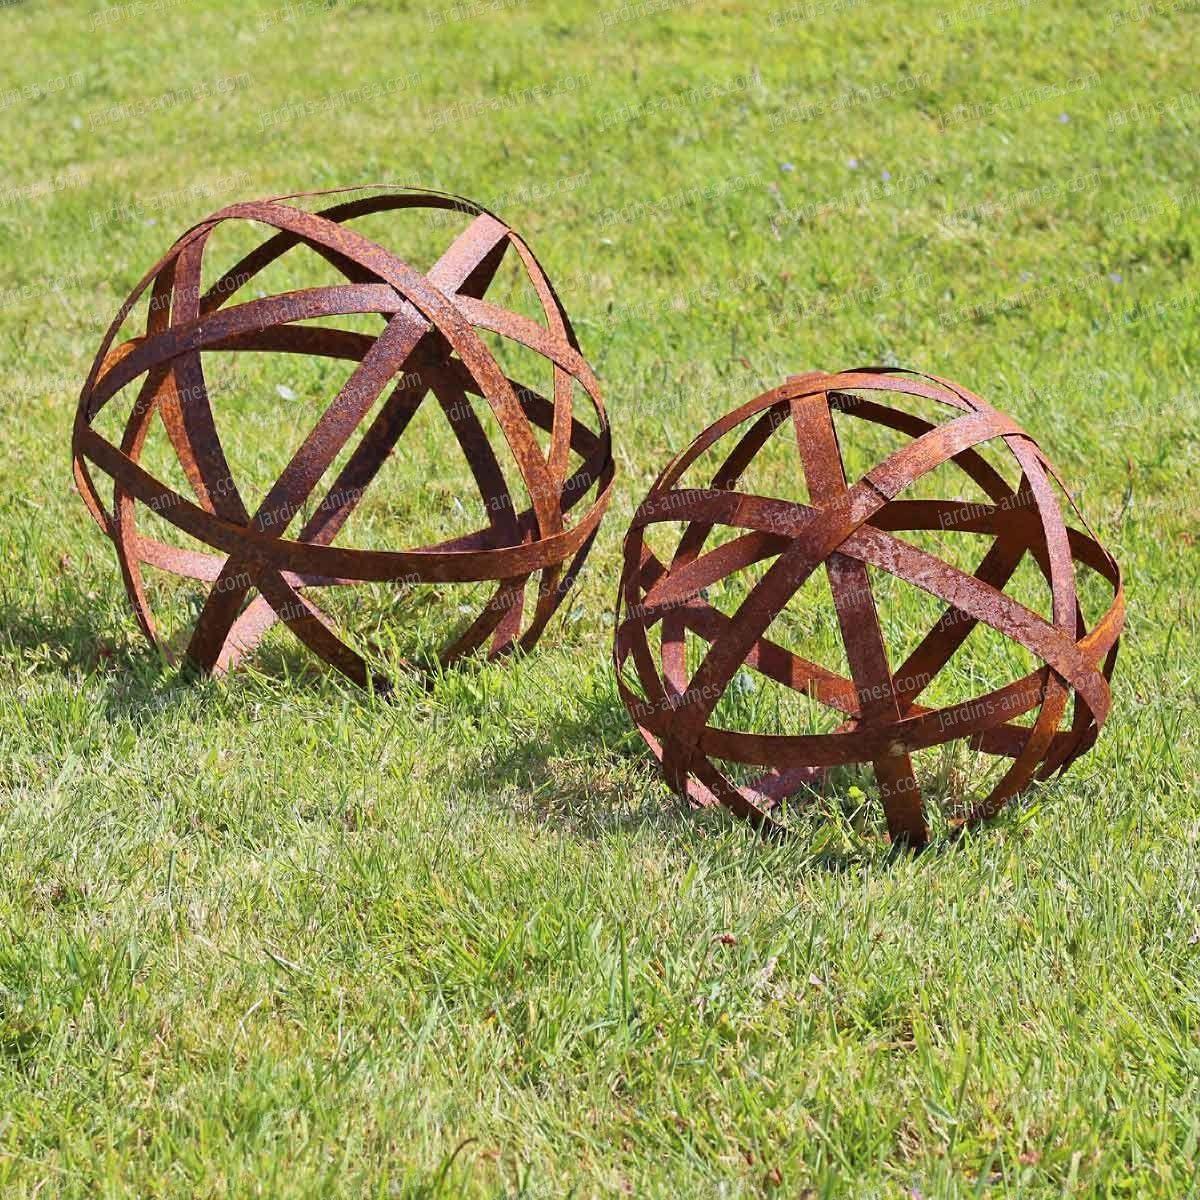 Boule A Arceaux Deco Jardin En Metal Jardin Terrasse Garden Gladiator Sandals Et Sandals